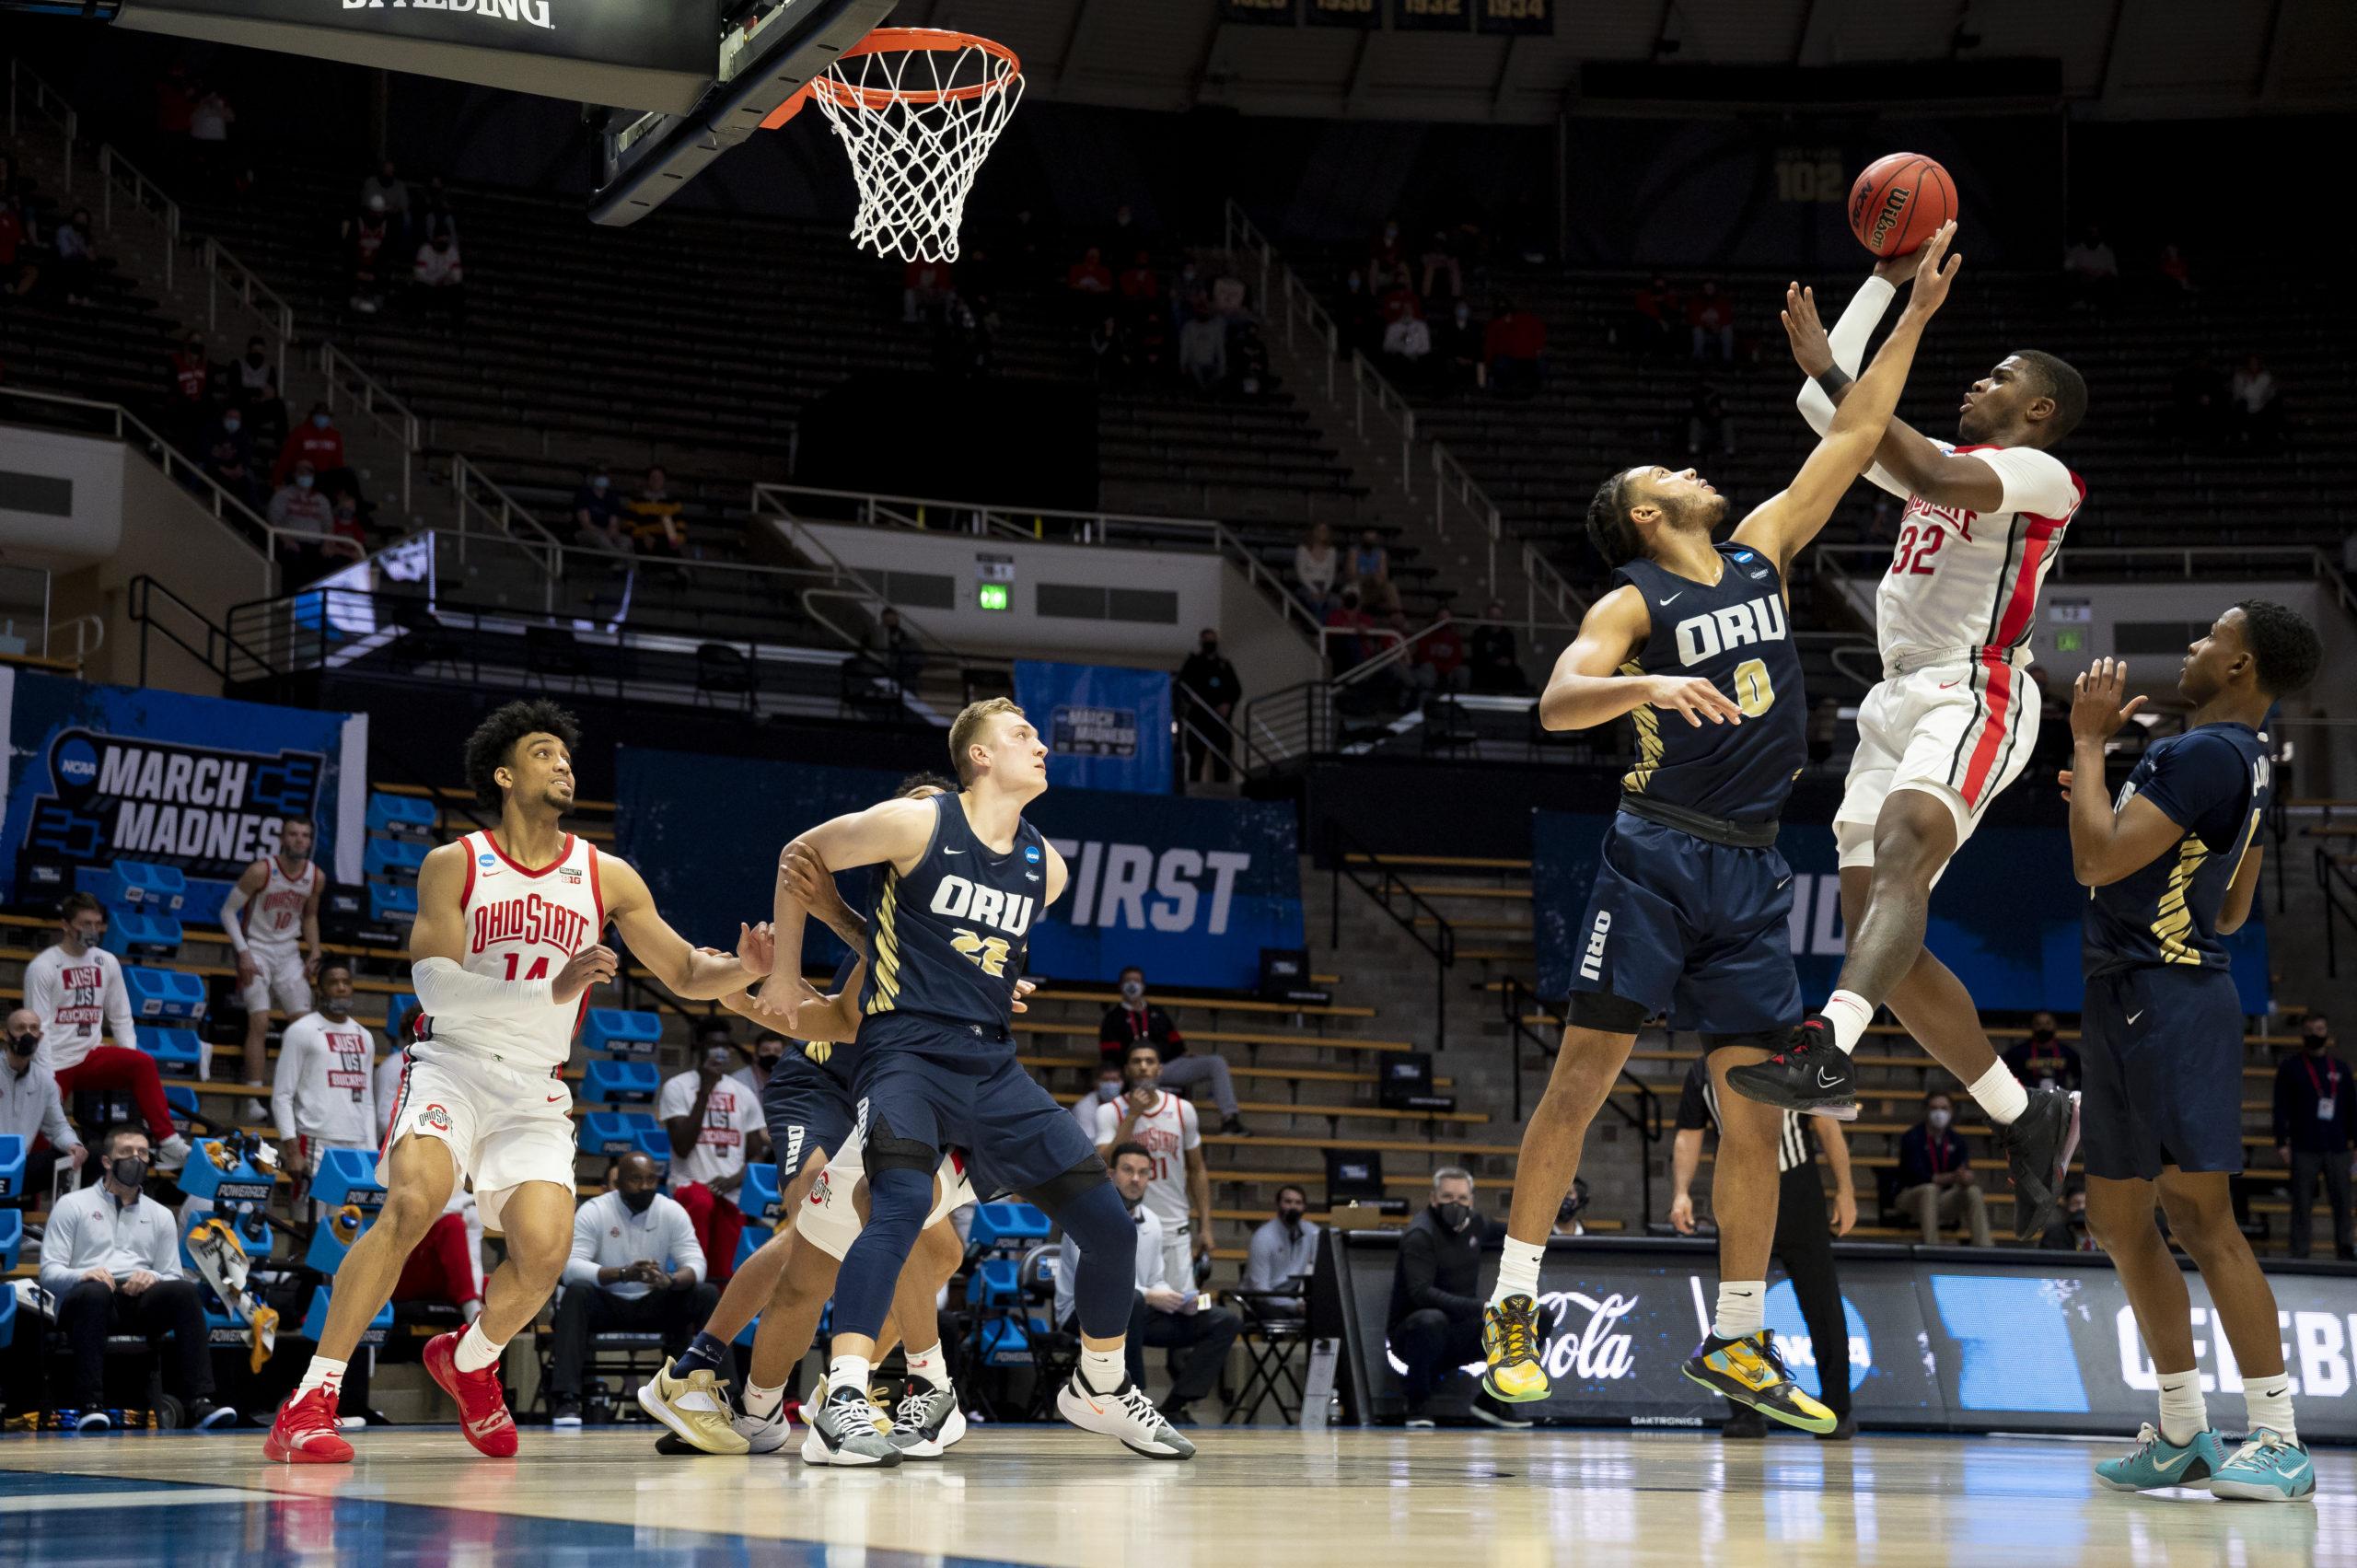 EJ-Liddell-Ohio-State-Buckeyes-Basketball